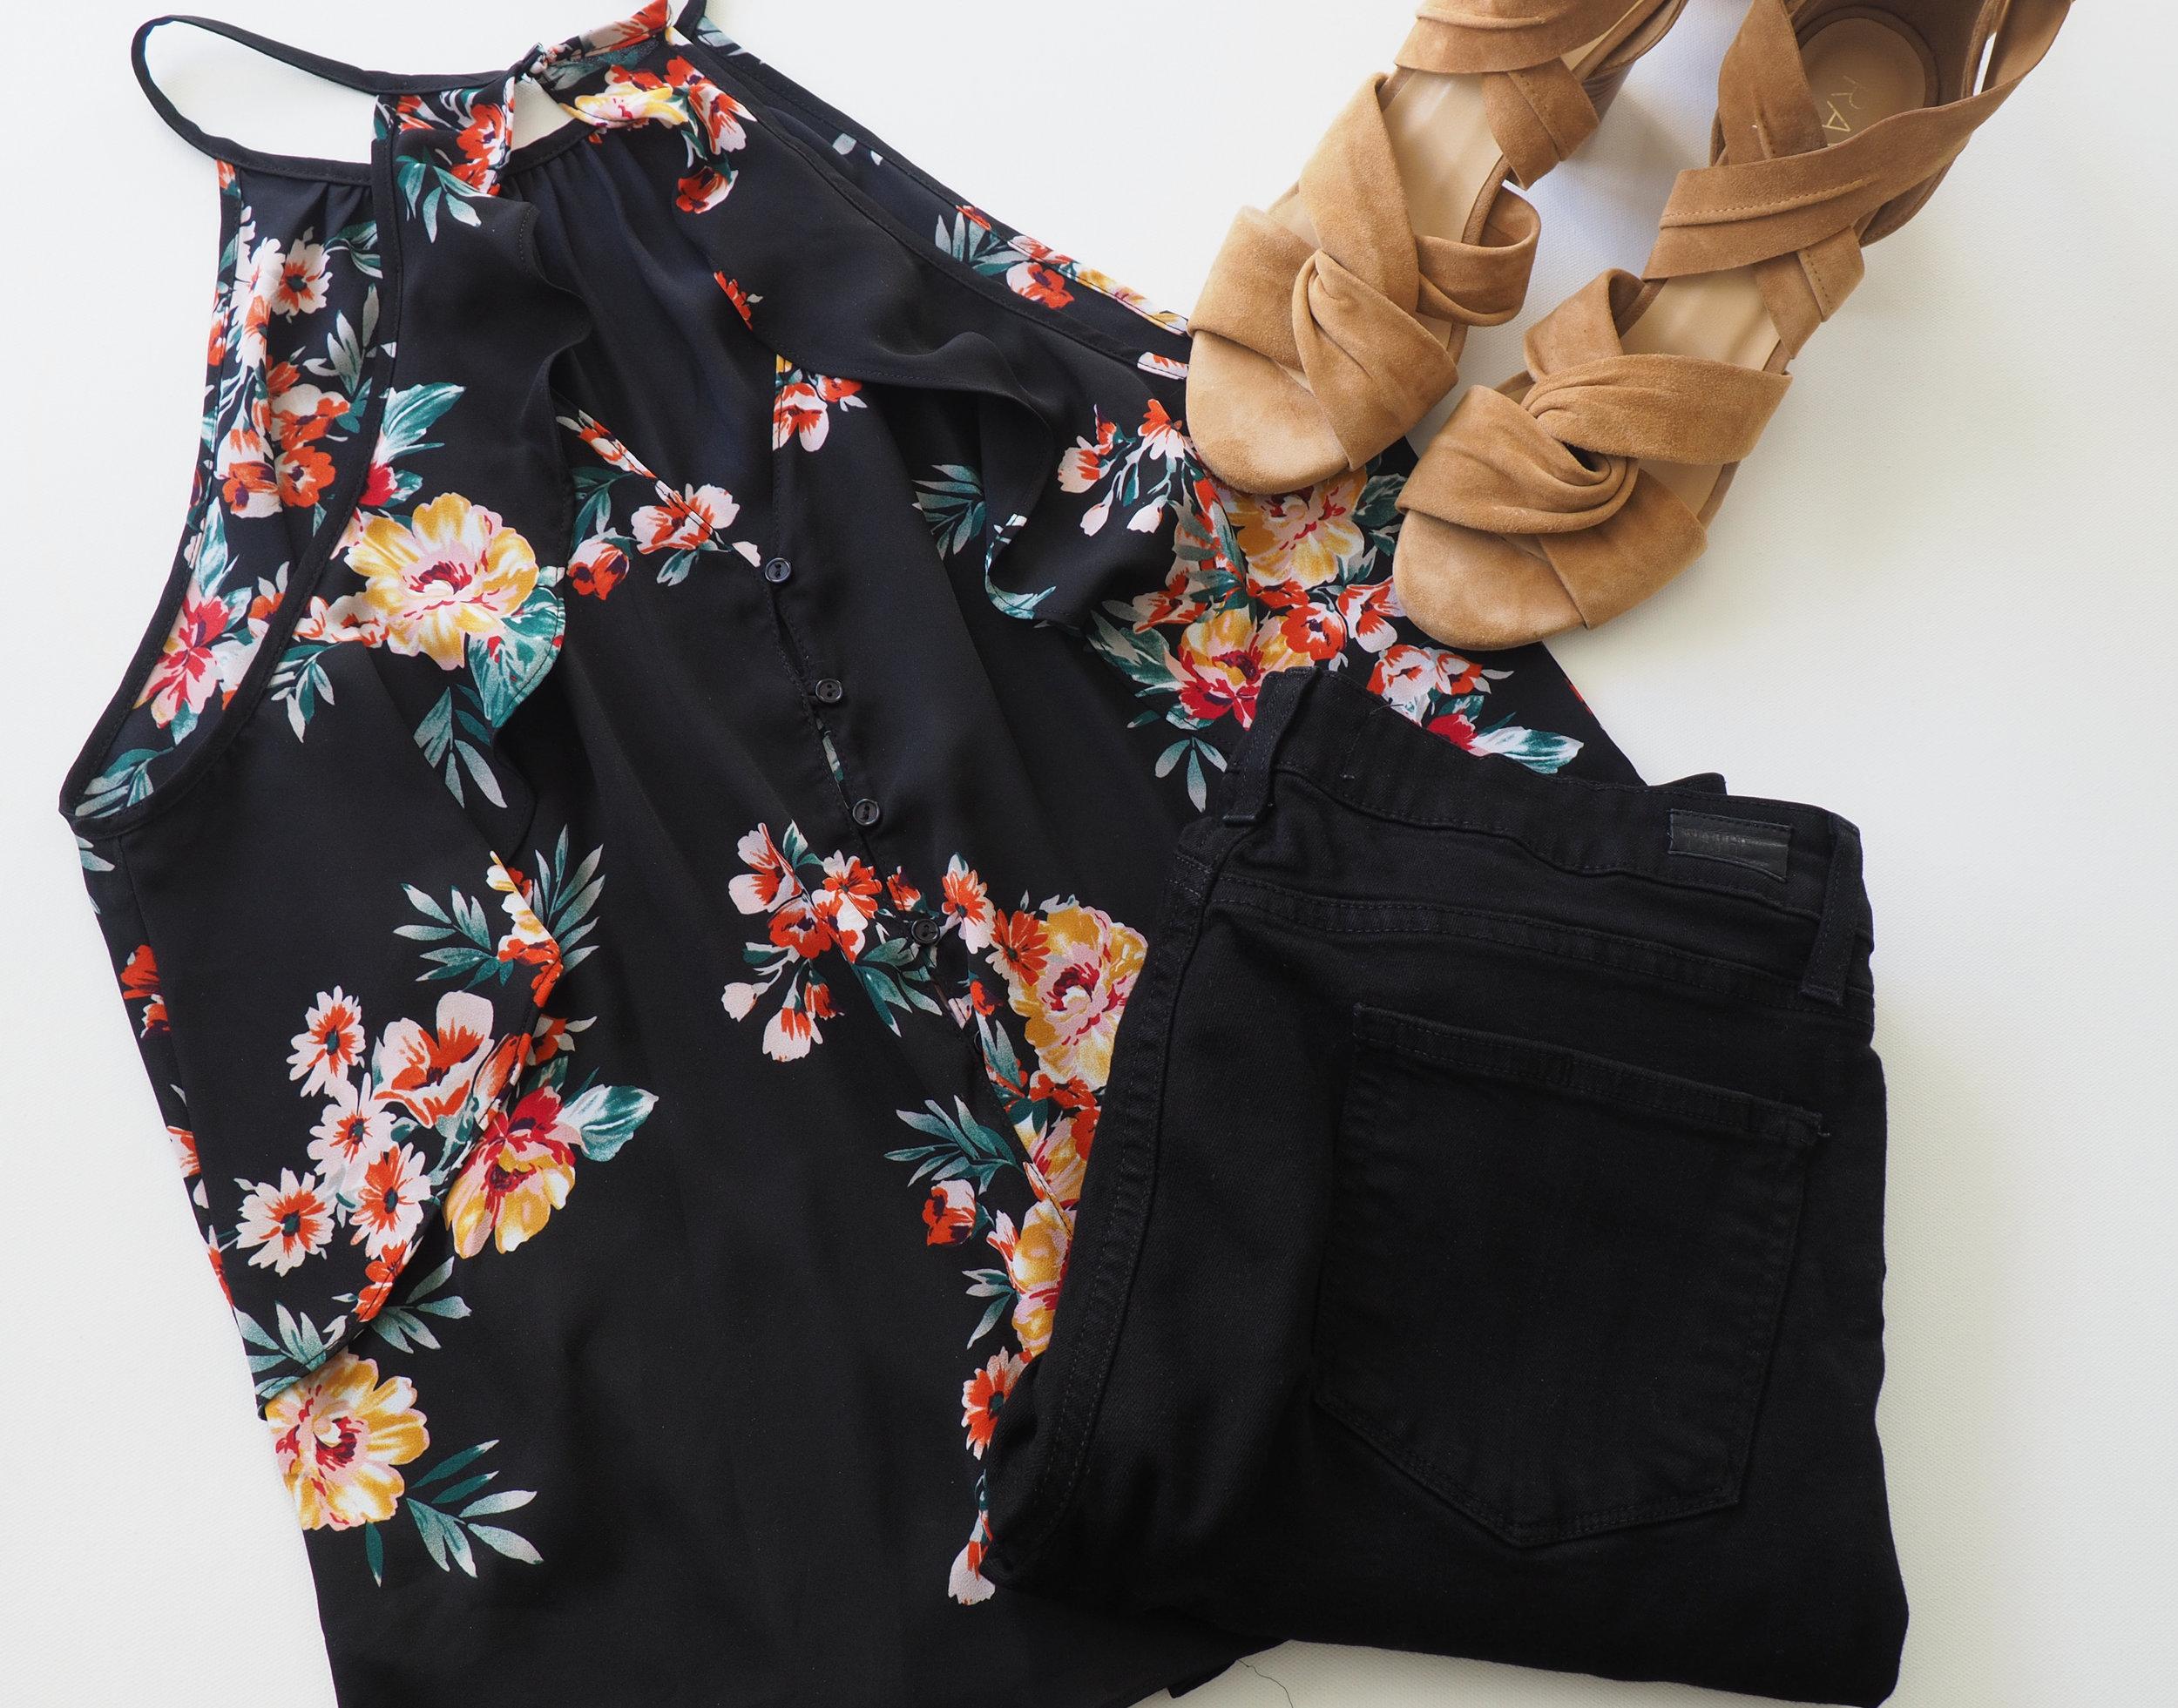 Floral Cami  (Similar)  |  Black Jeans  | Sandals  (Same style, different color)